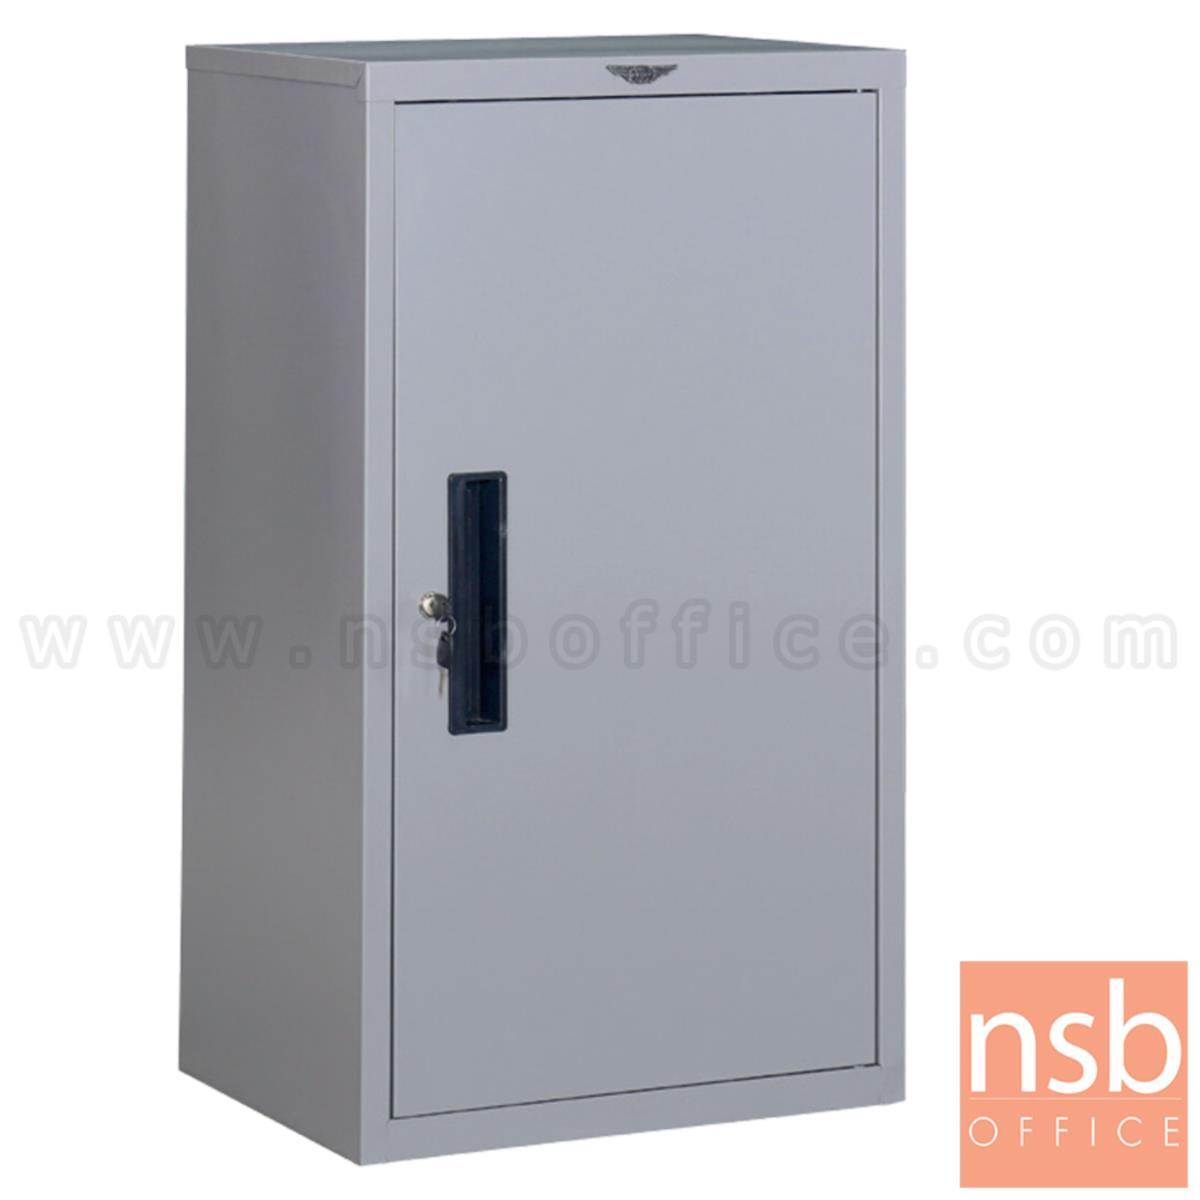 E07A085:ตู้เหล็กอเนกประสงค์ บานเปิดทึบ รุ่น Essense (เอสเซ็นส์) ขนาด 45W*87.3H cm. กุญแจล็อก